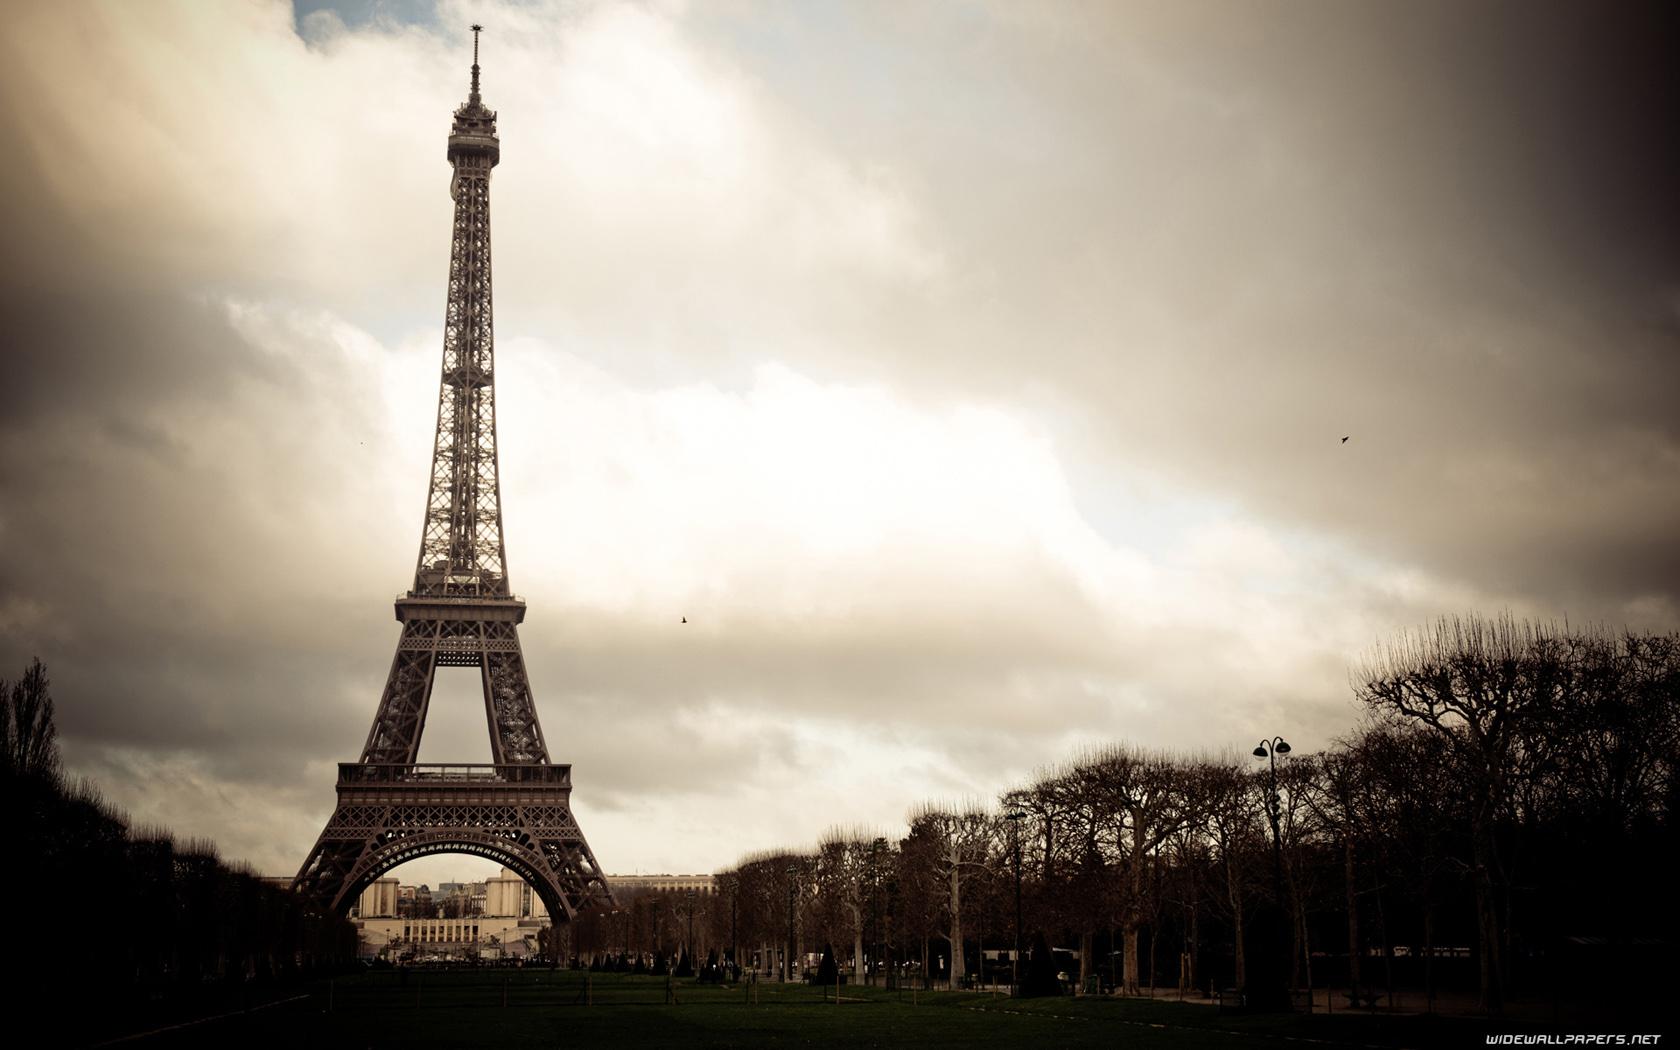 Hd wallpaper paris - Paris Wallpaper Paris Wallpaper Hd Wallpaper Hd Paris Eiffel